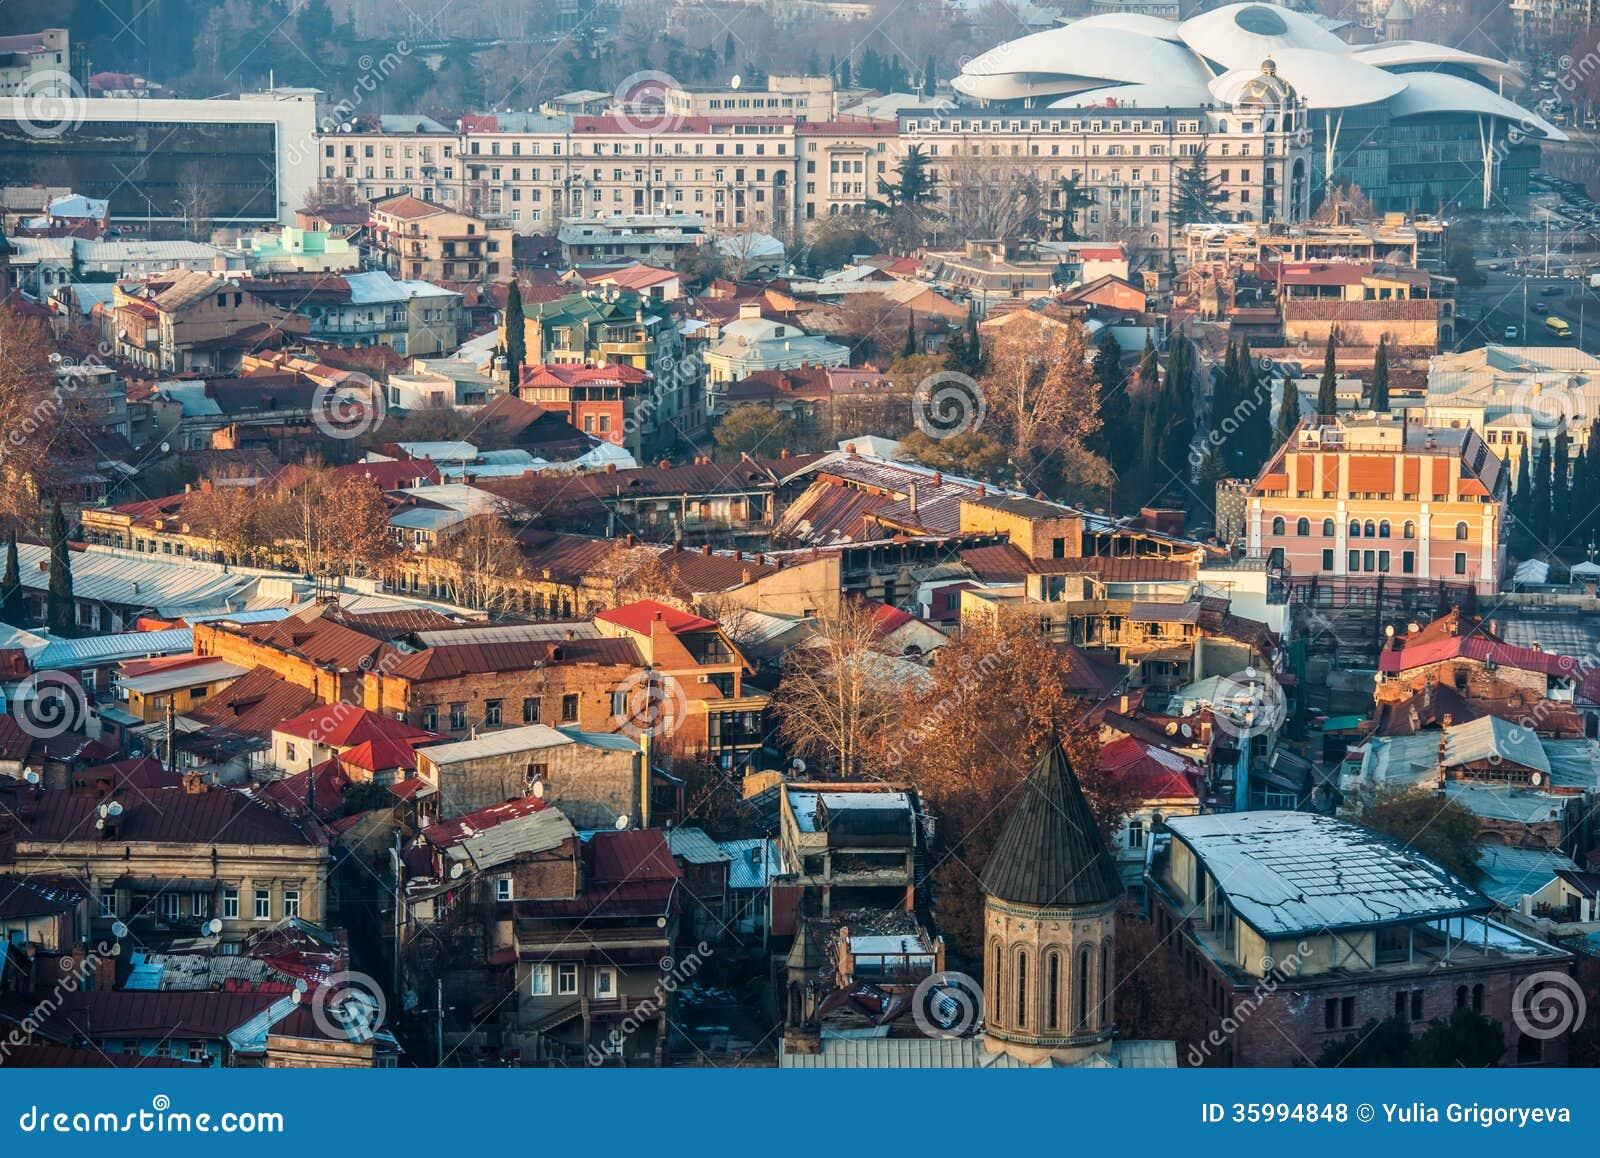 Tbilisi Georgia Police Stock Photos Tbilisi Georgia: Tbilisi Royalty Free Stock Photos